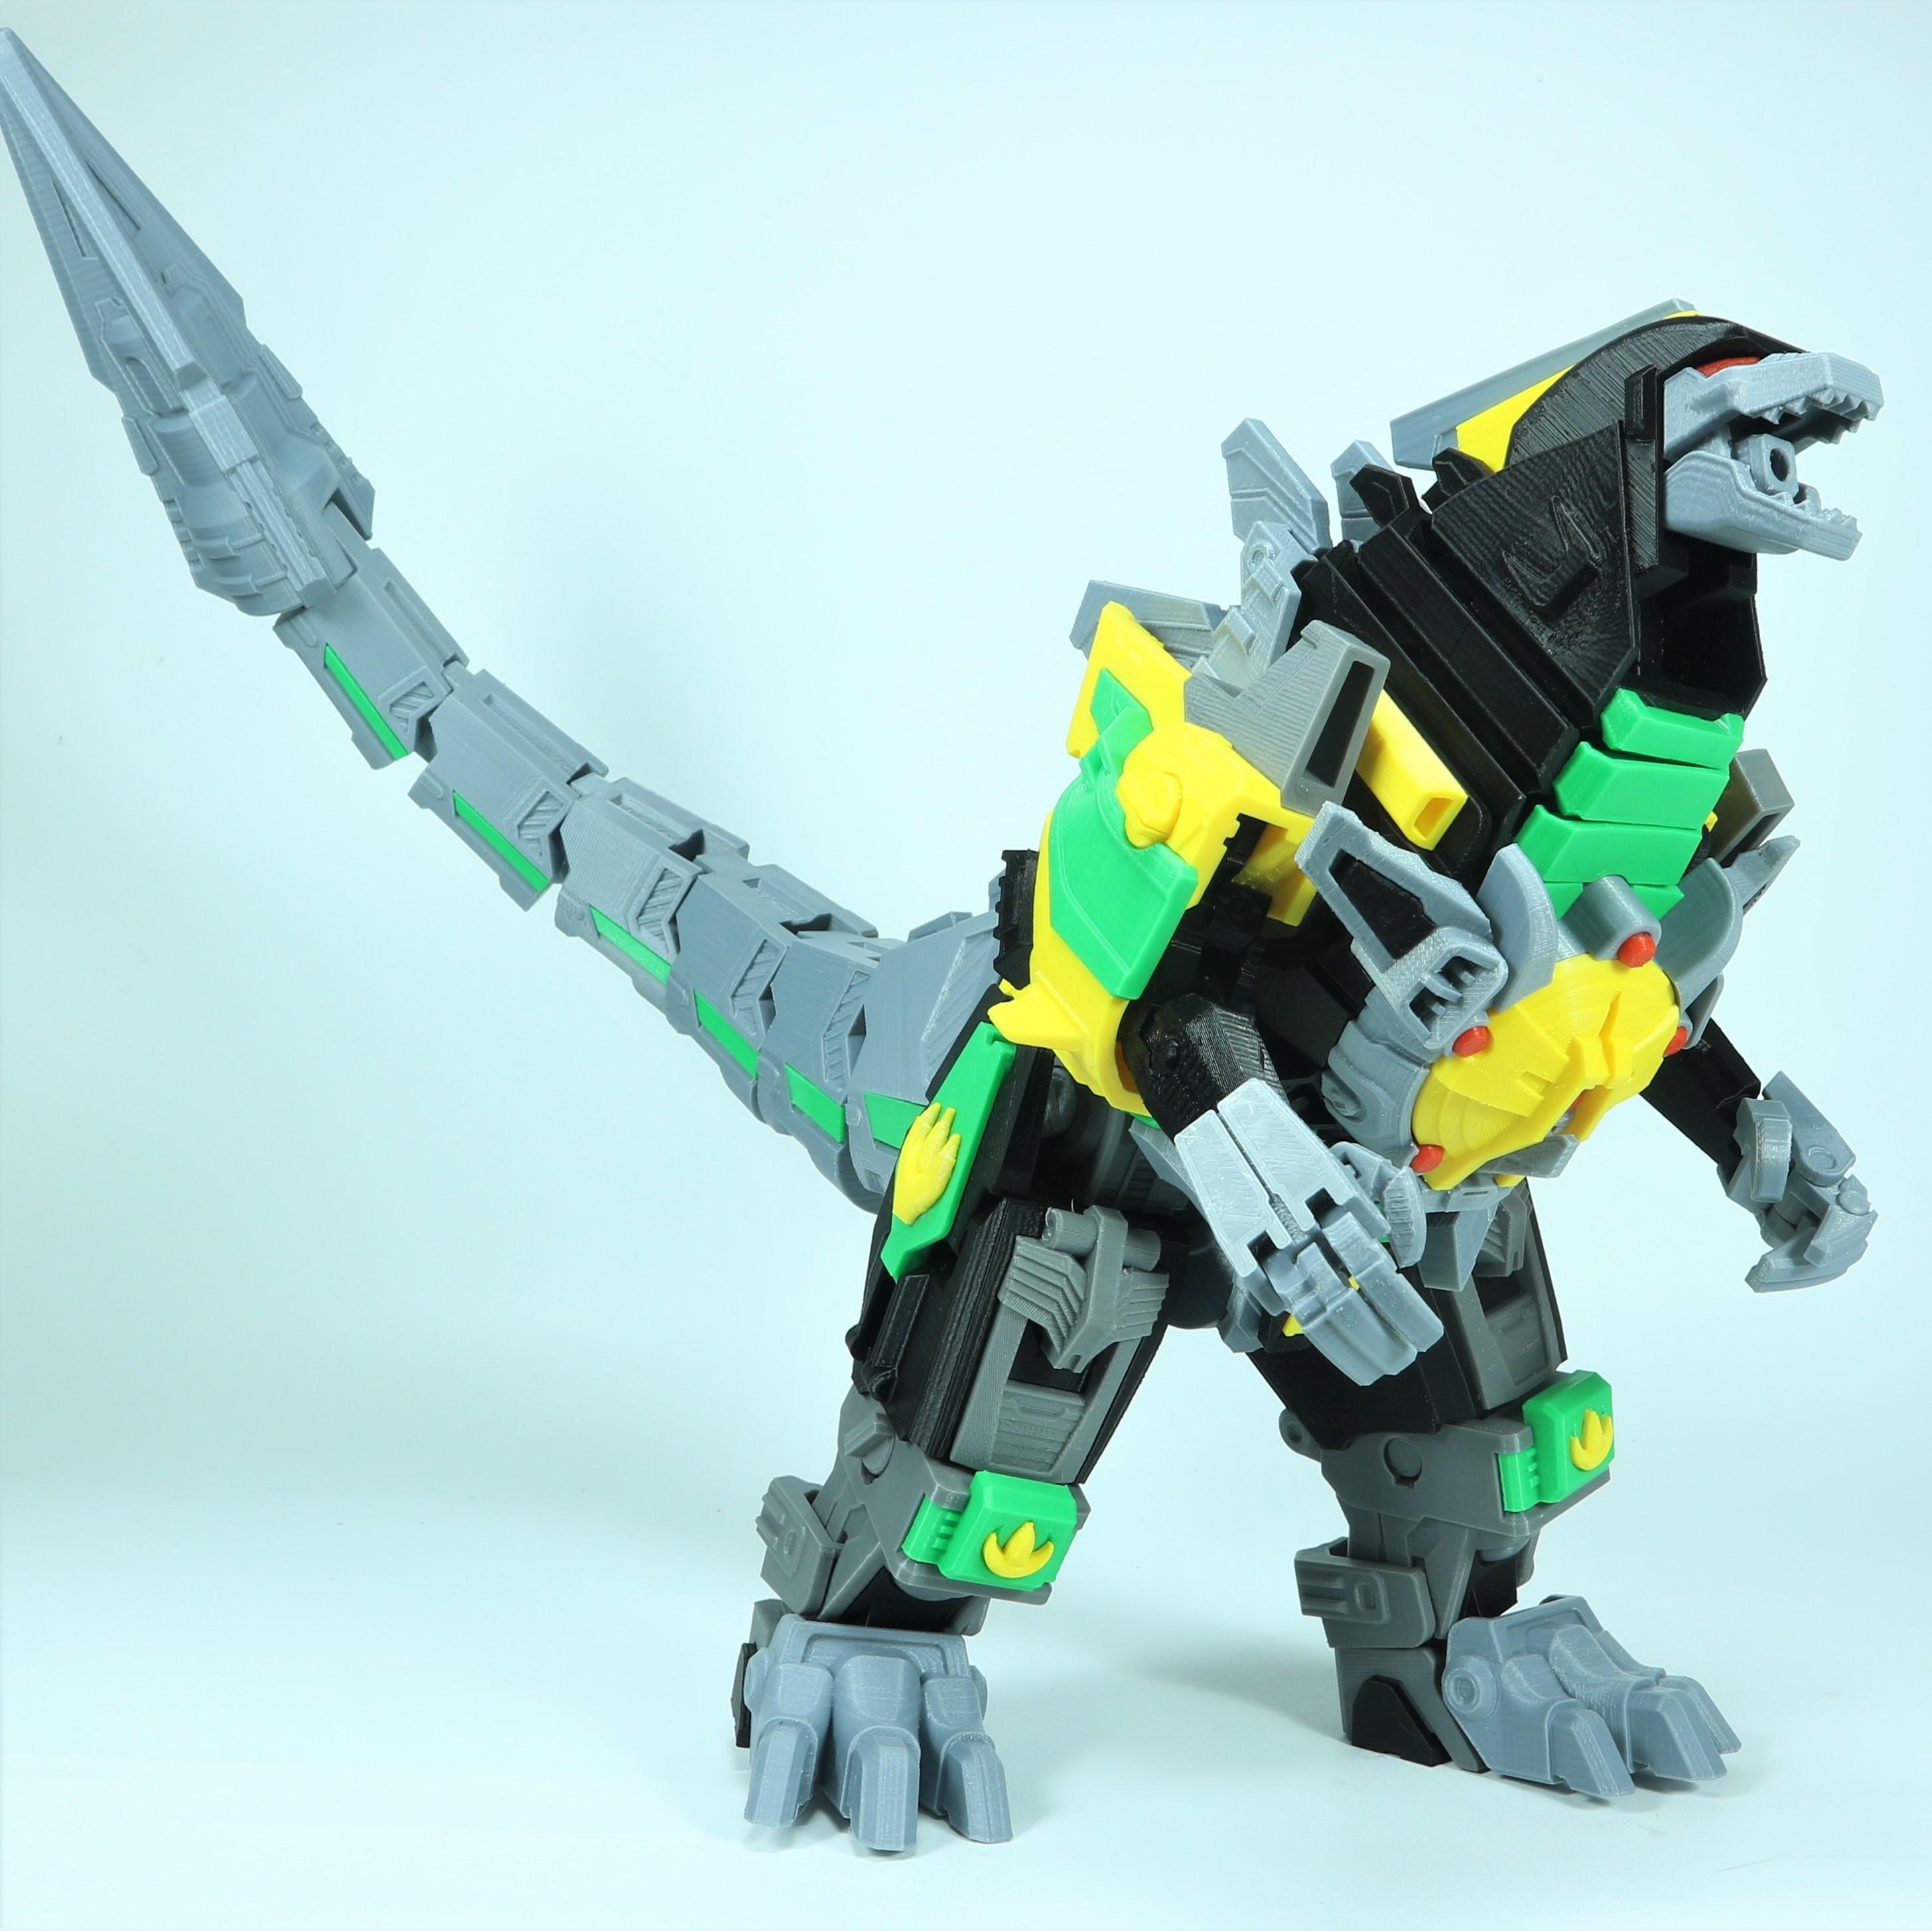 Drag_1X1_8.jpg Download STL file ARTICULATED DRAGONLORD (not Dragonzord) - NO SUPPORT • 3D printer model, Toymakr3D